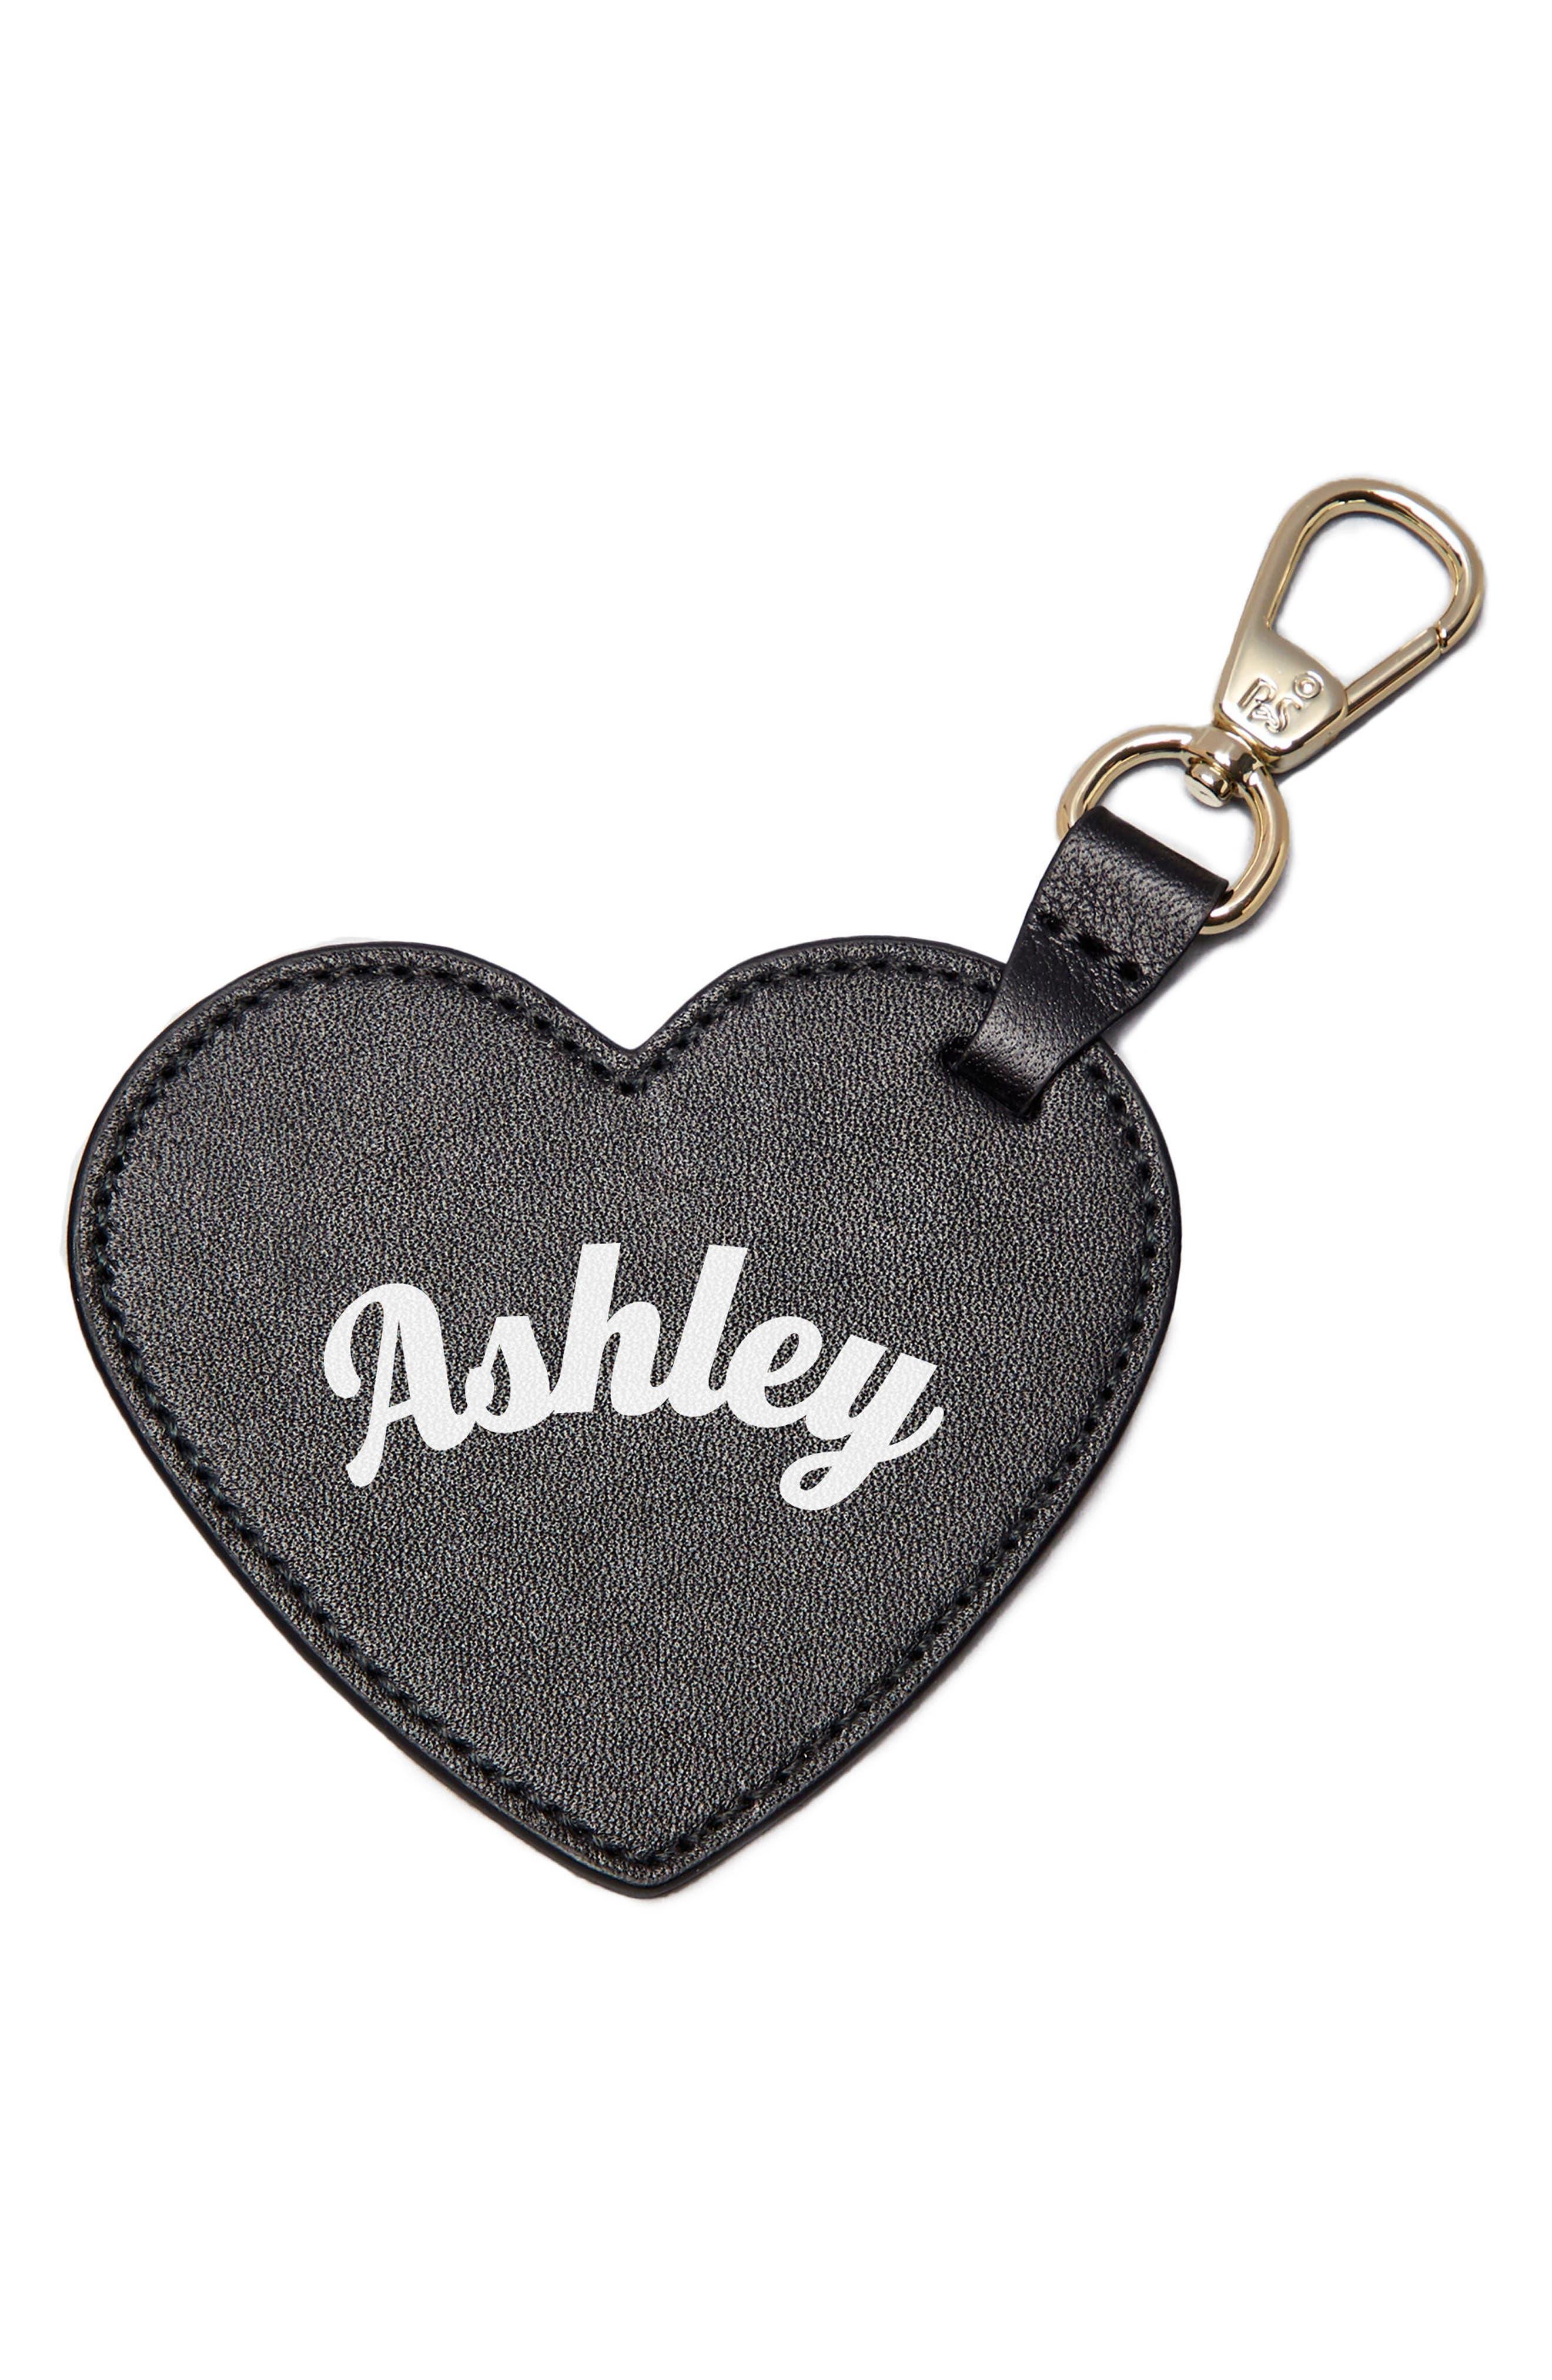 Smaller Heart Personalized Bag Charm,                             Main thumbnail 1, color,                             Noir/ White